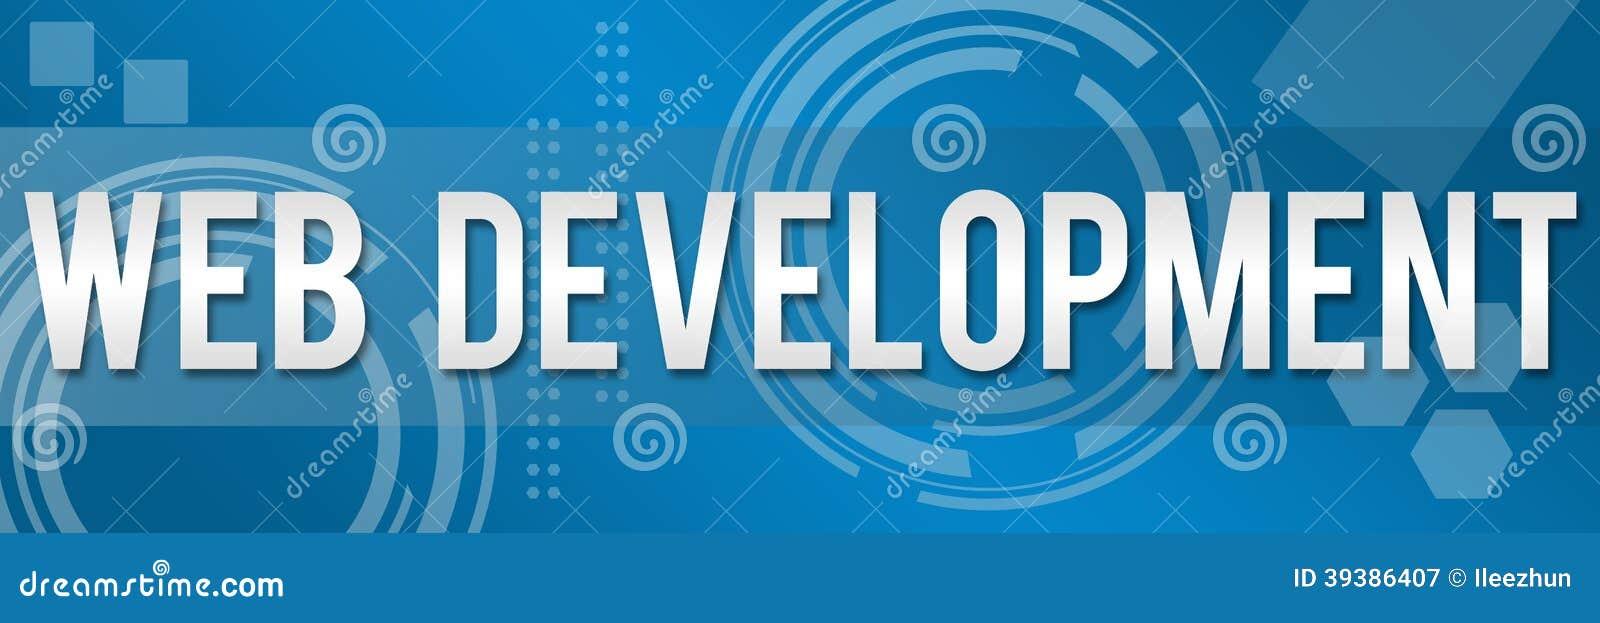 Web Development Business Background Banner Stock Image ...